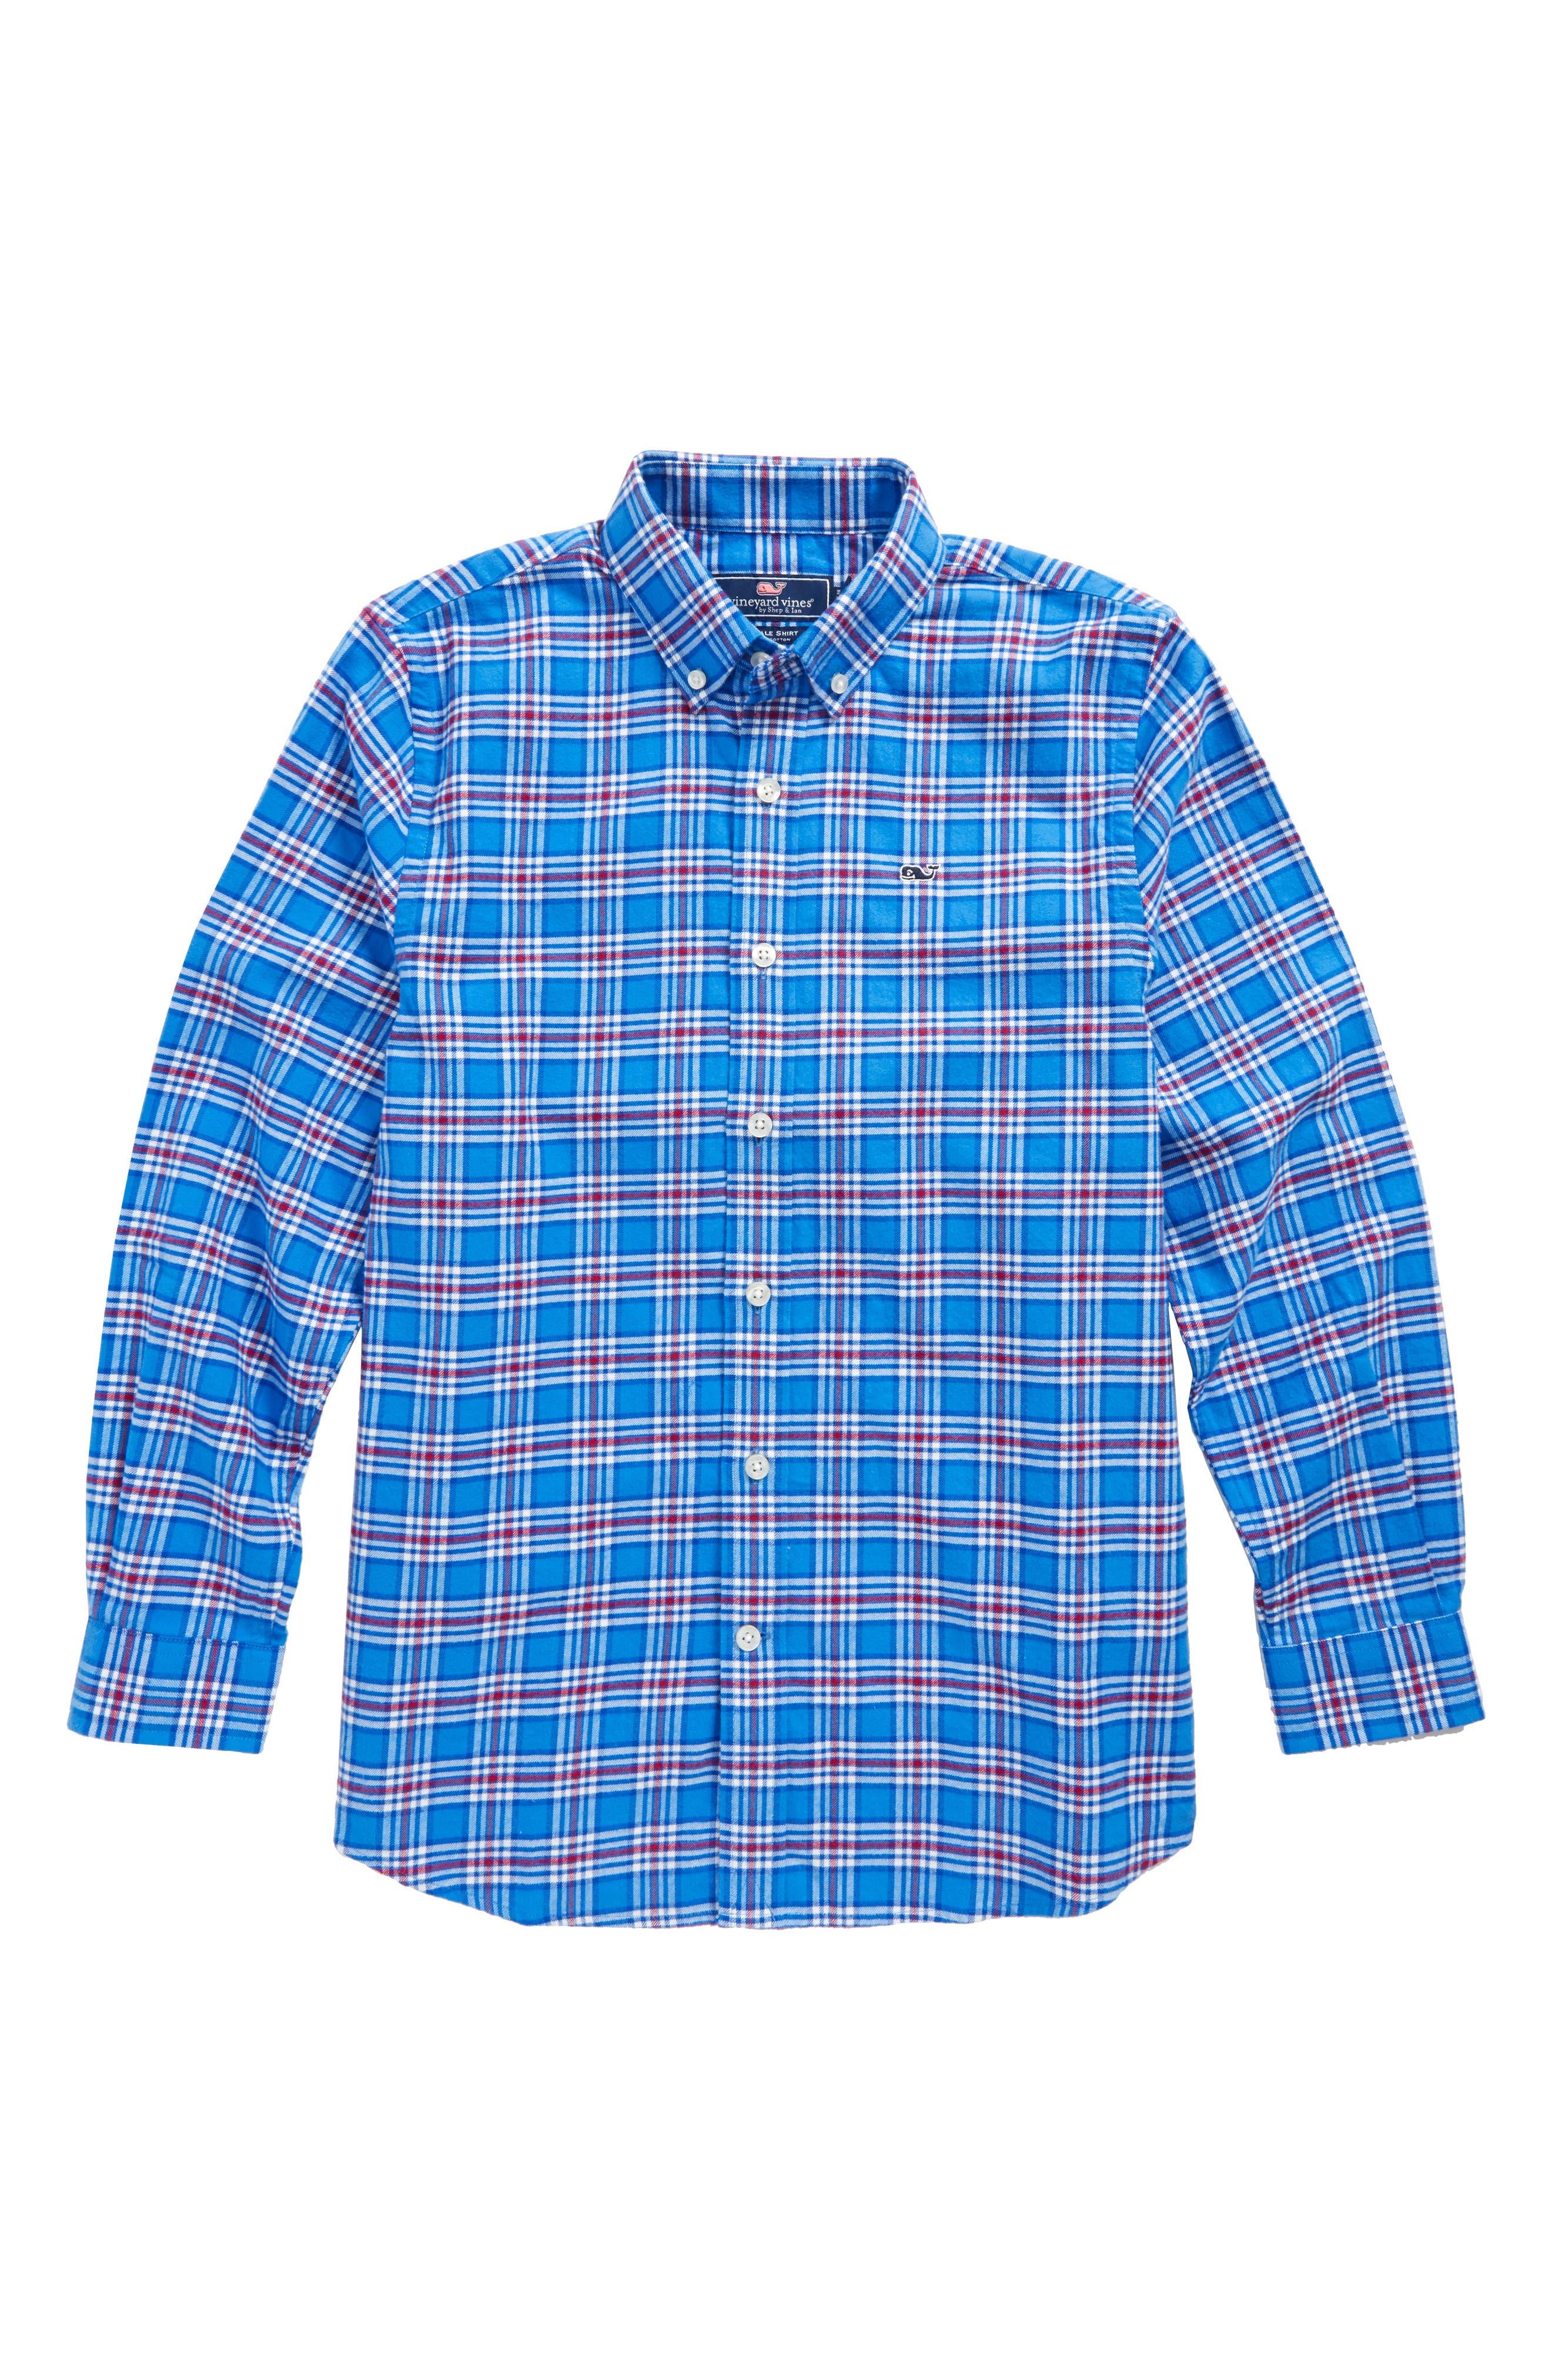 Chandler Pond Plaid Flannel Shirt,                         Main,                         color, 400